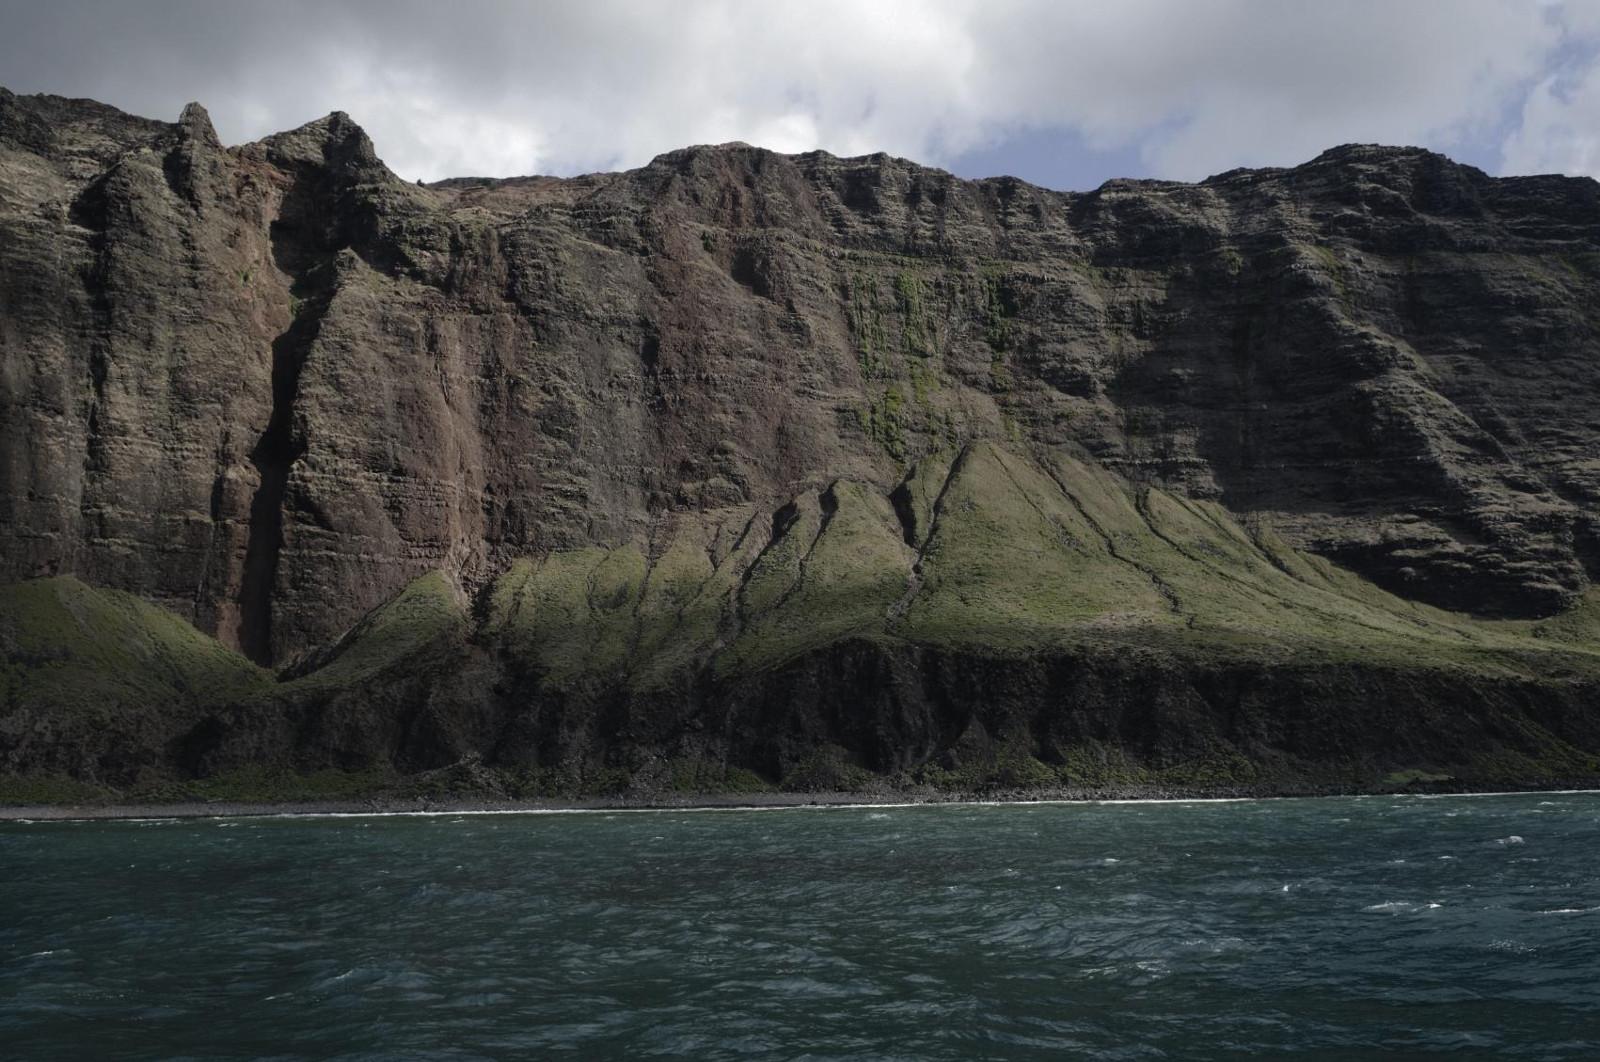 TNRTB Classic: Water and Plate Tectonics